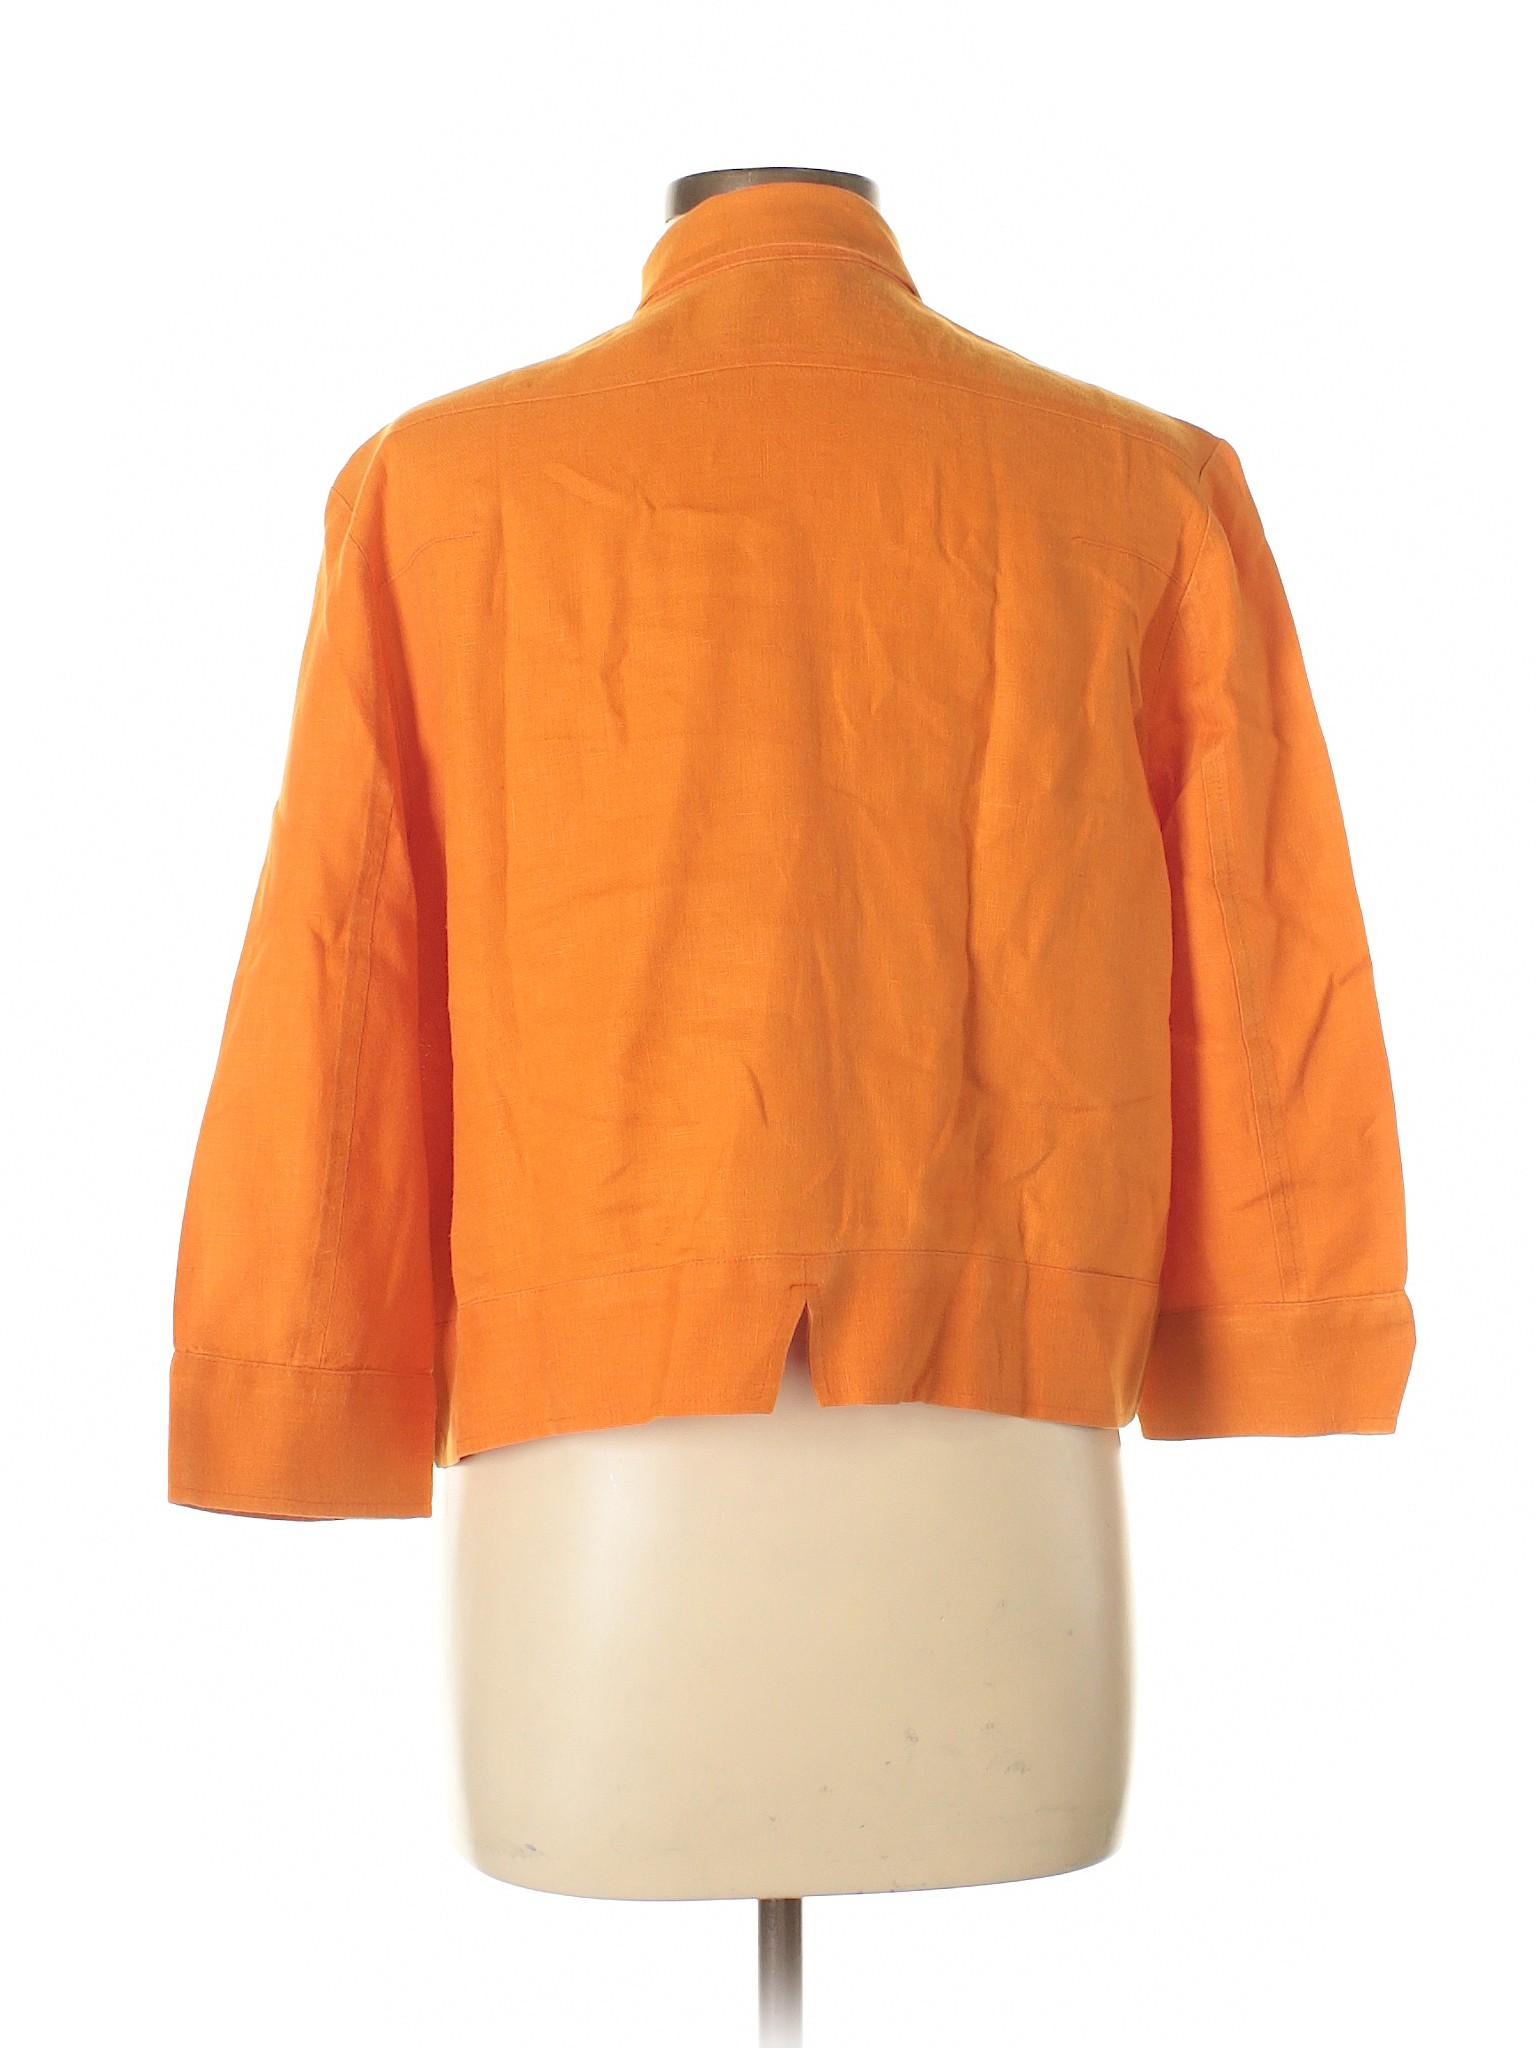 Elliott Boutique leisure leisure Lauren Boutique Elliott Boutique Jacket Boutique Lauren Elliott leisure Jacket Lauren leisure Jacket Oxdw7pvq